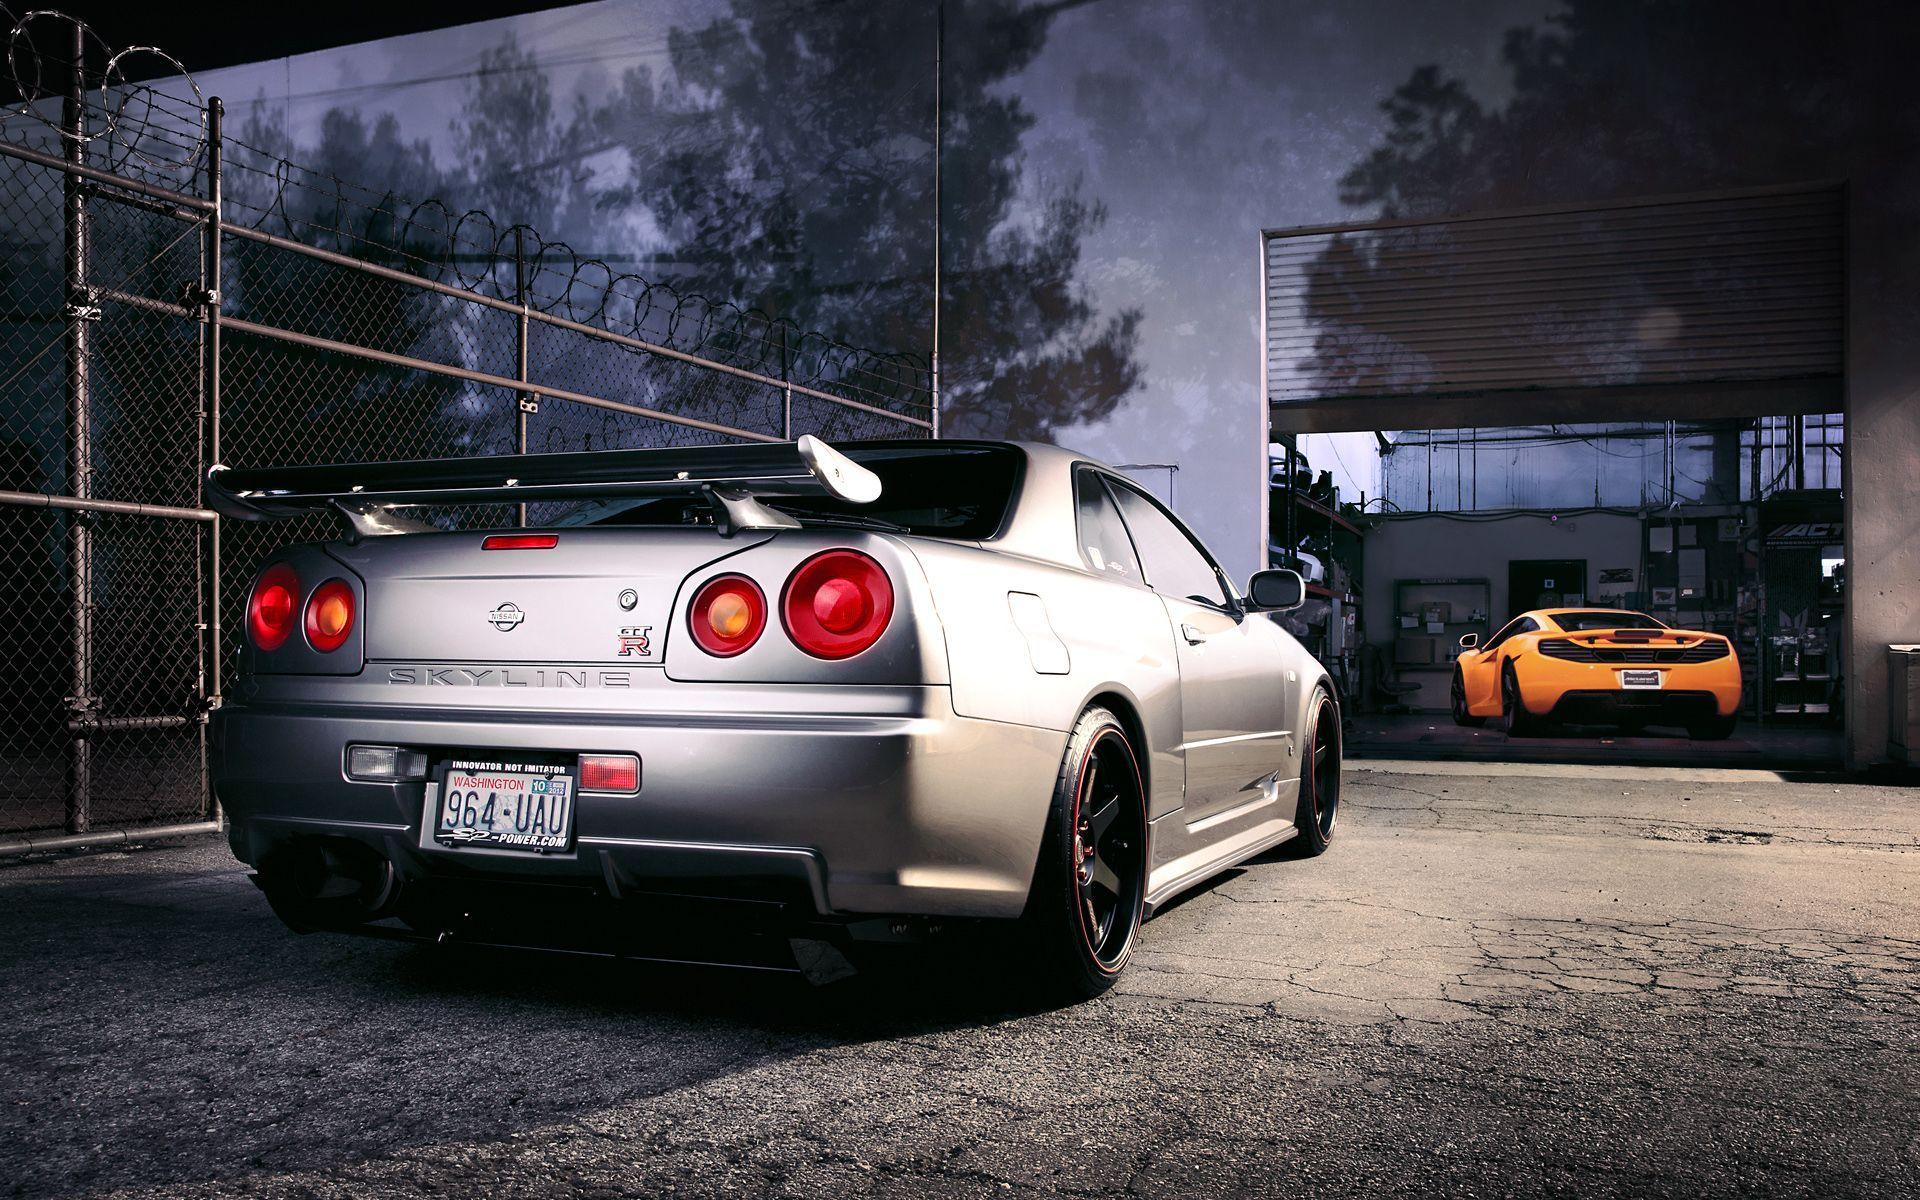 Nissan Skyline GTR R34 Wallpapers Group 89